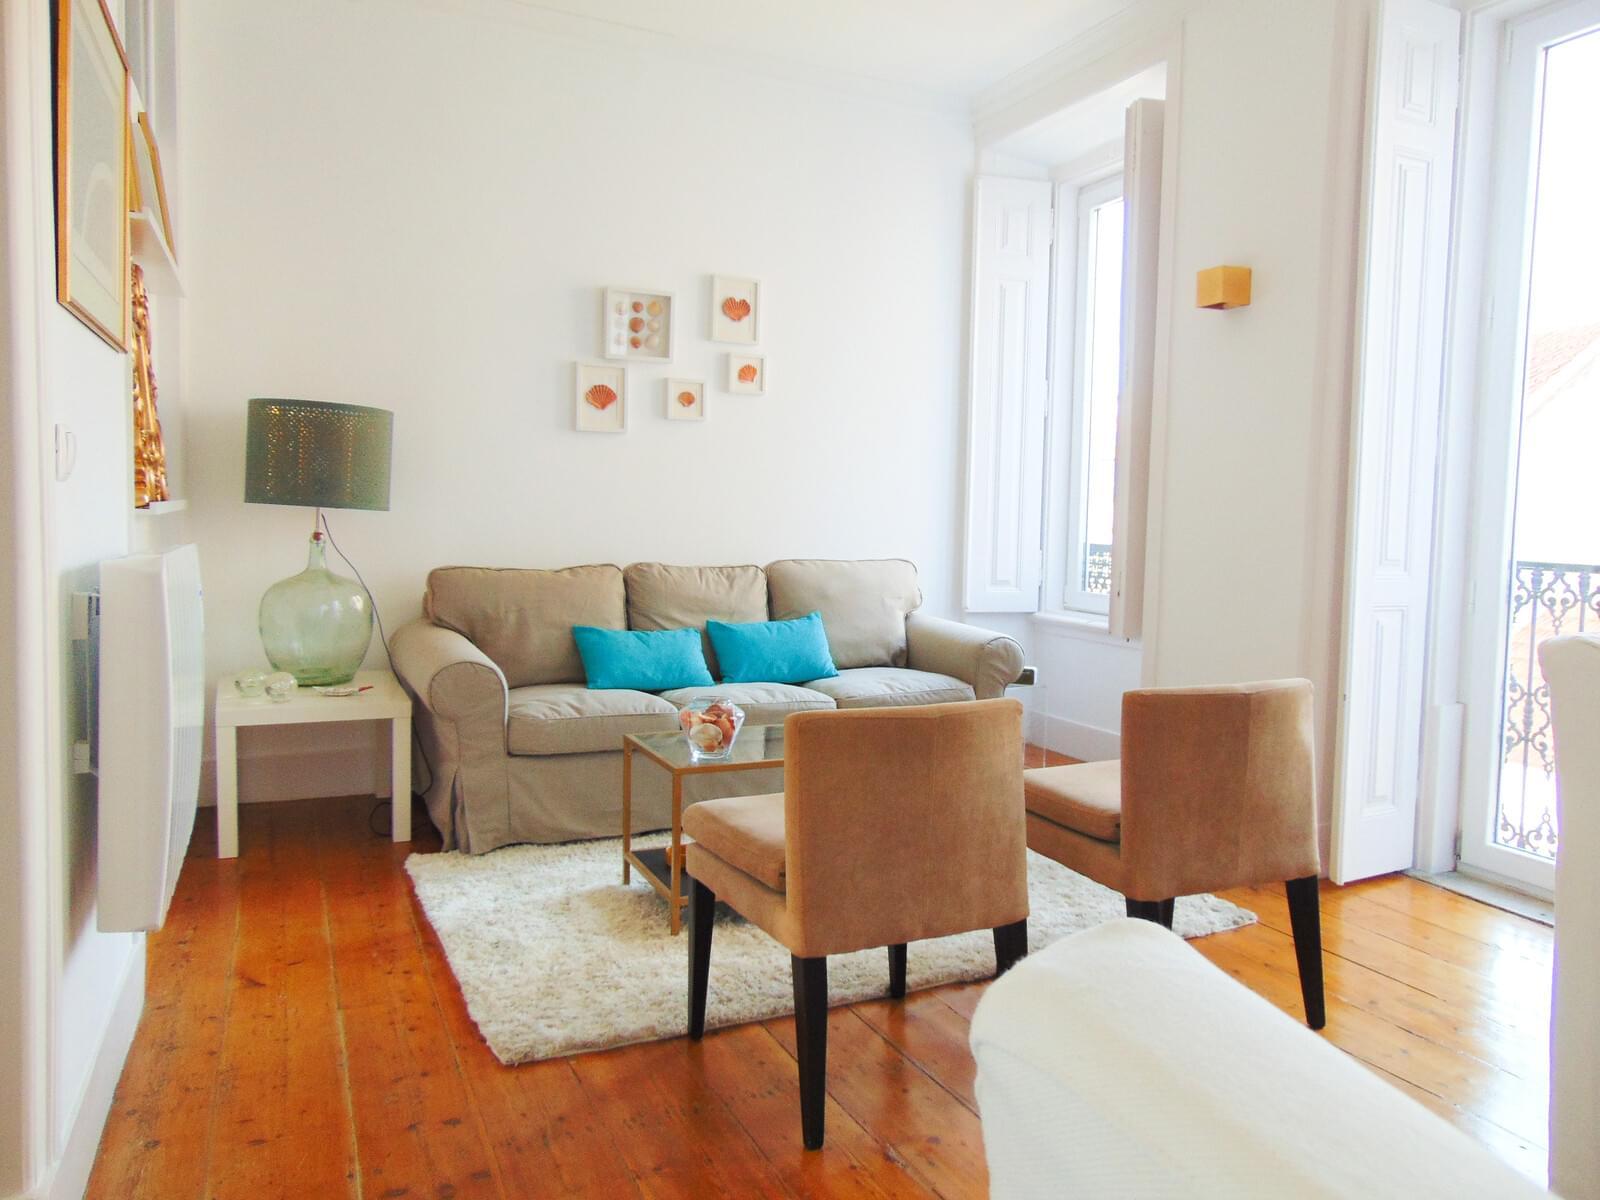 pf18269-apartamento-t1-lisboa-eb6c047a-b39b-4abb-a481-7b0dd67c096b